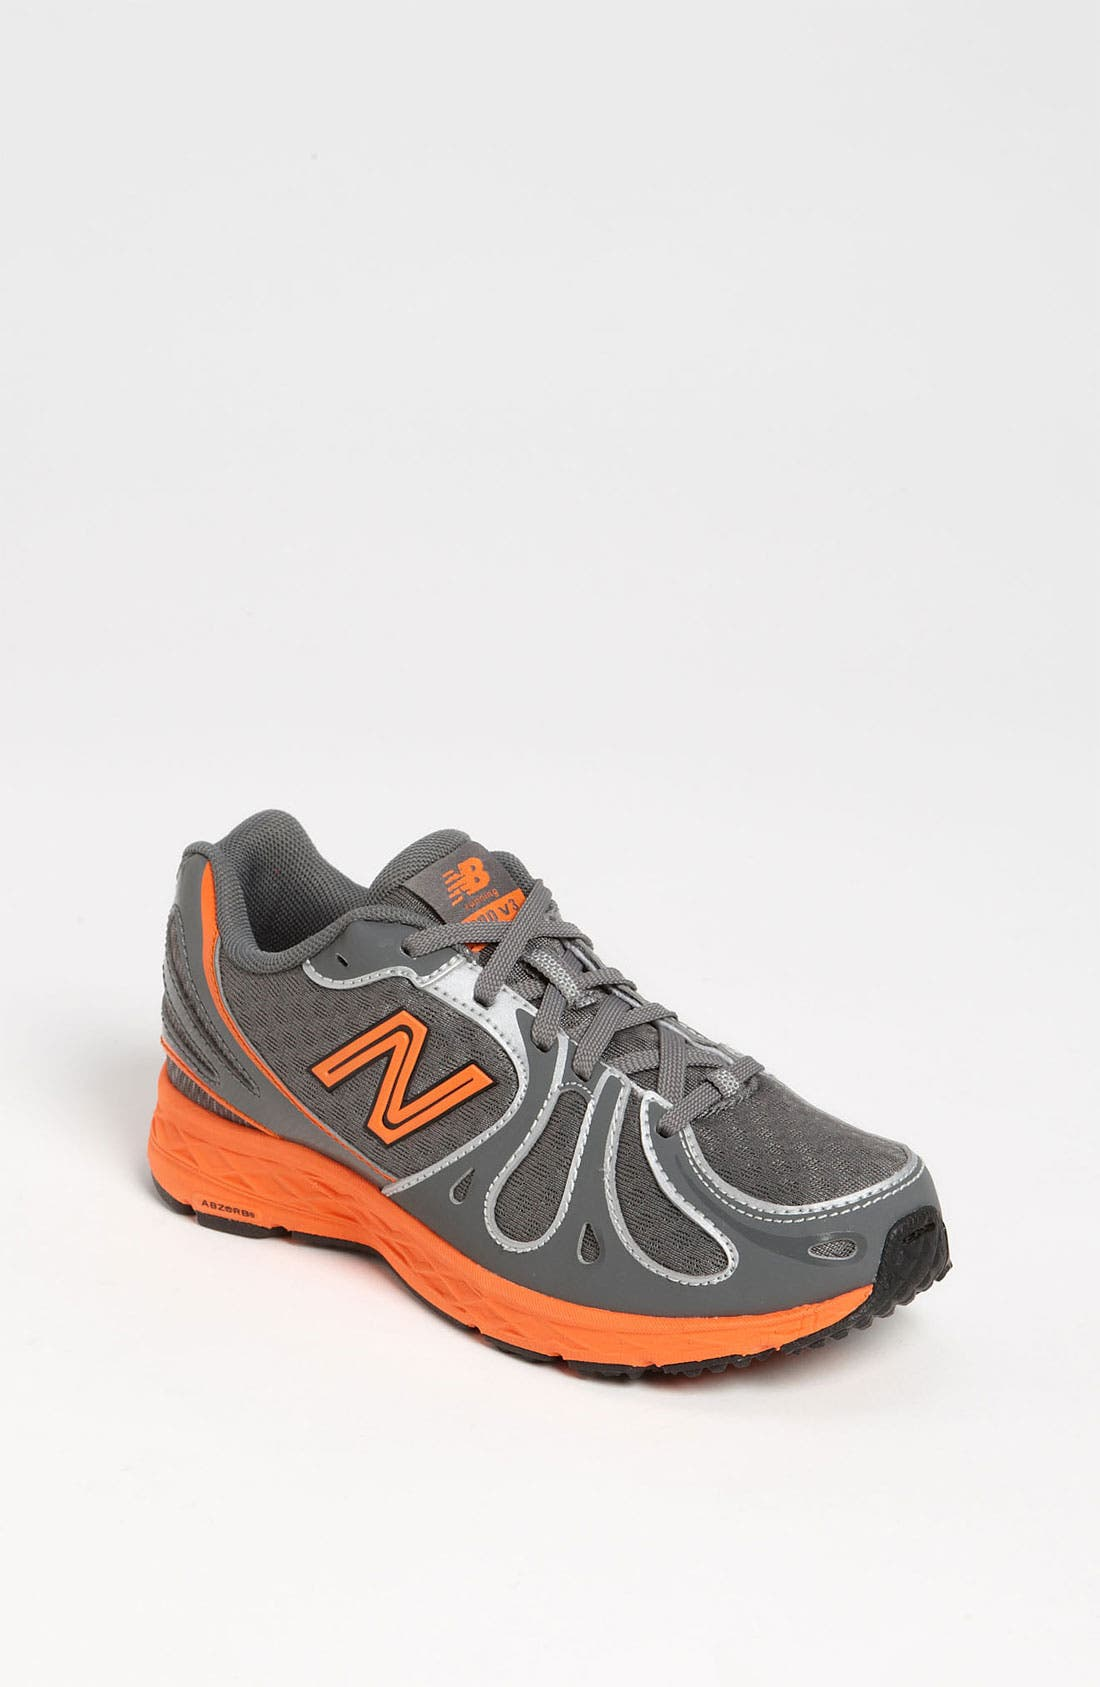 Main Image - New Balance '890' Sneaker (Toddler, Little Kid & Big Kid) (Online Only)